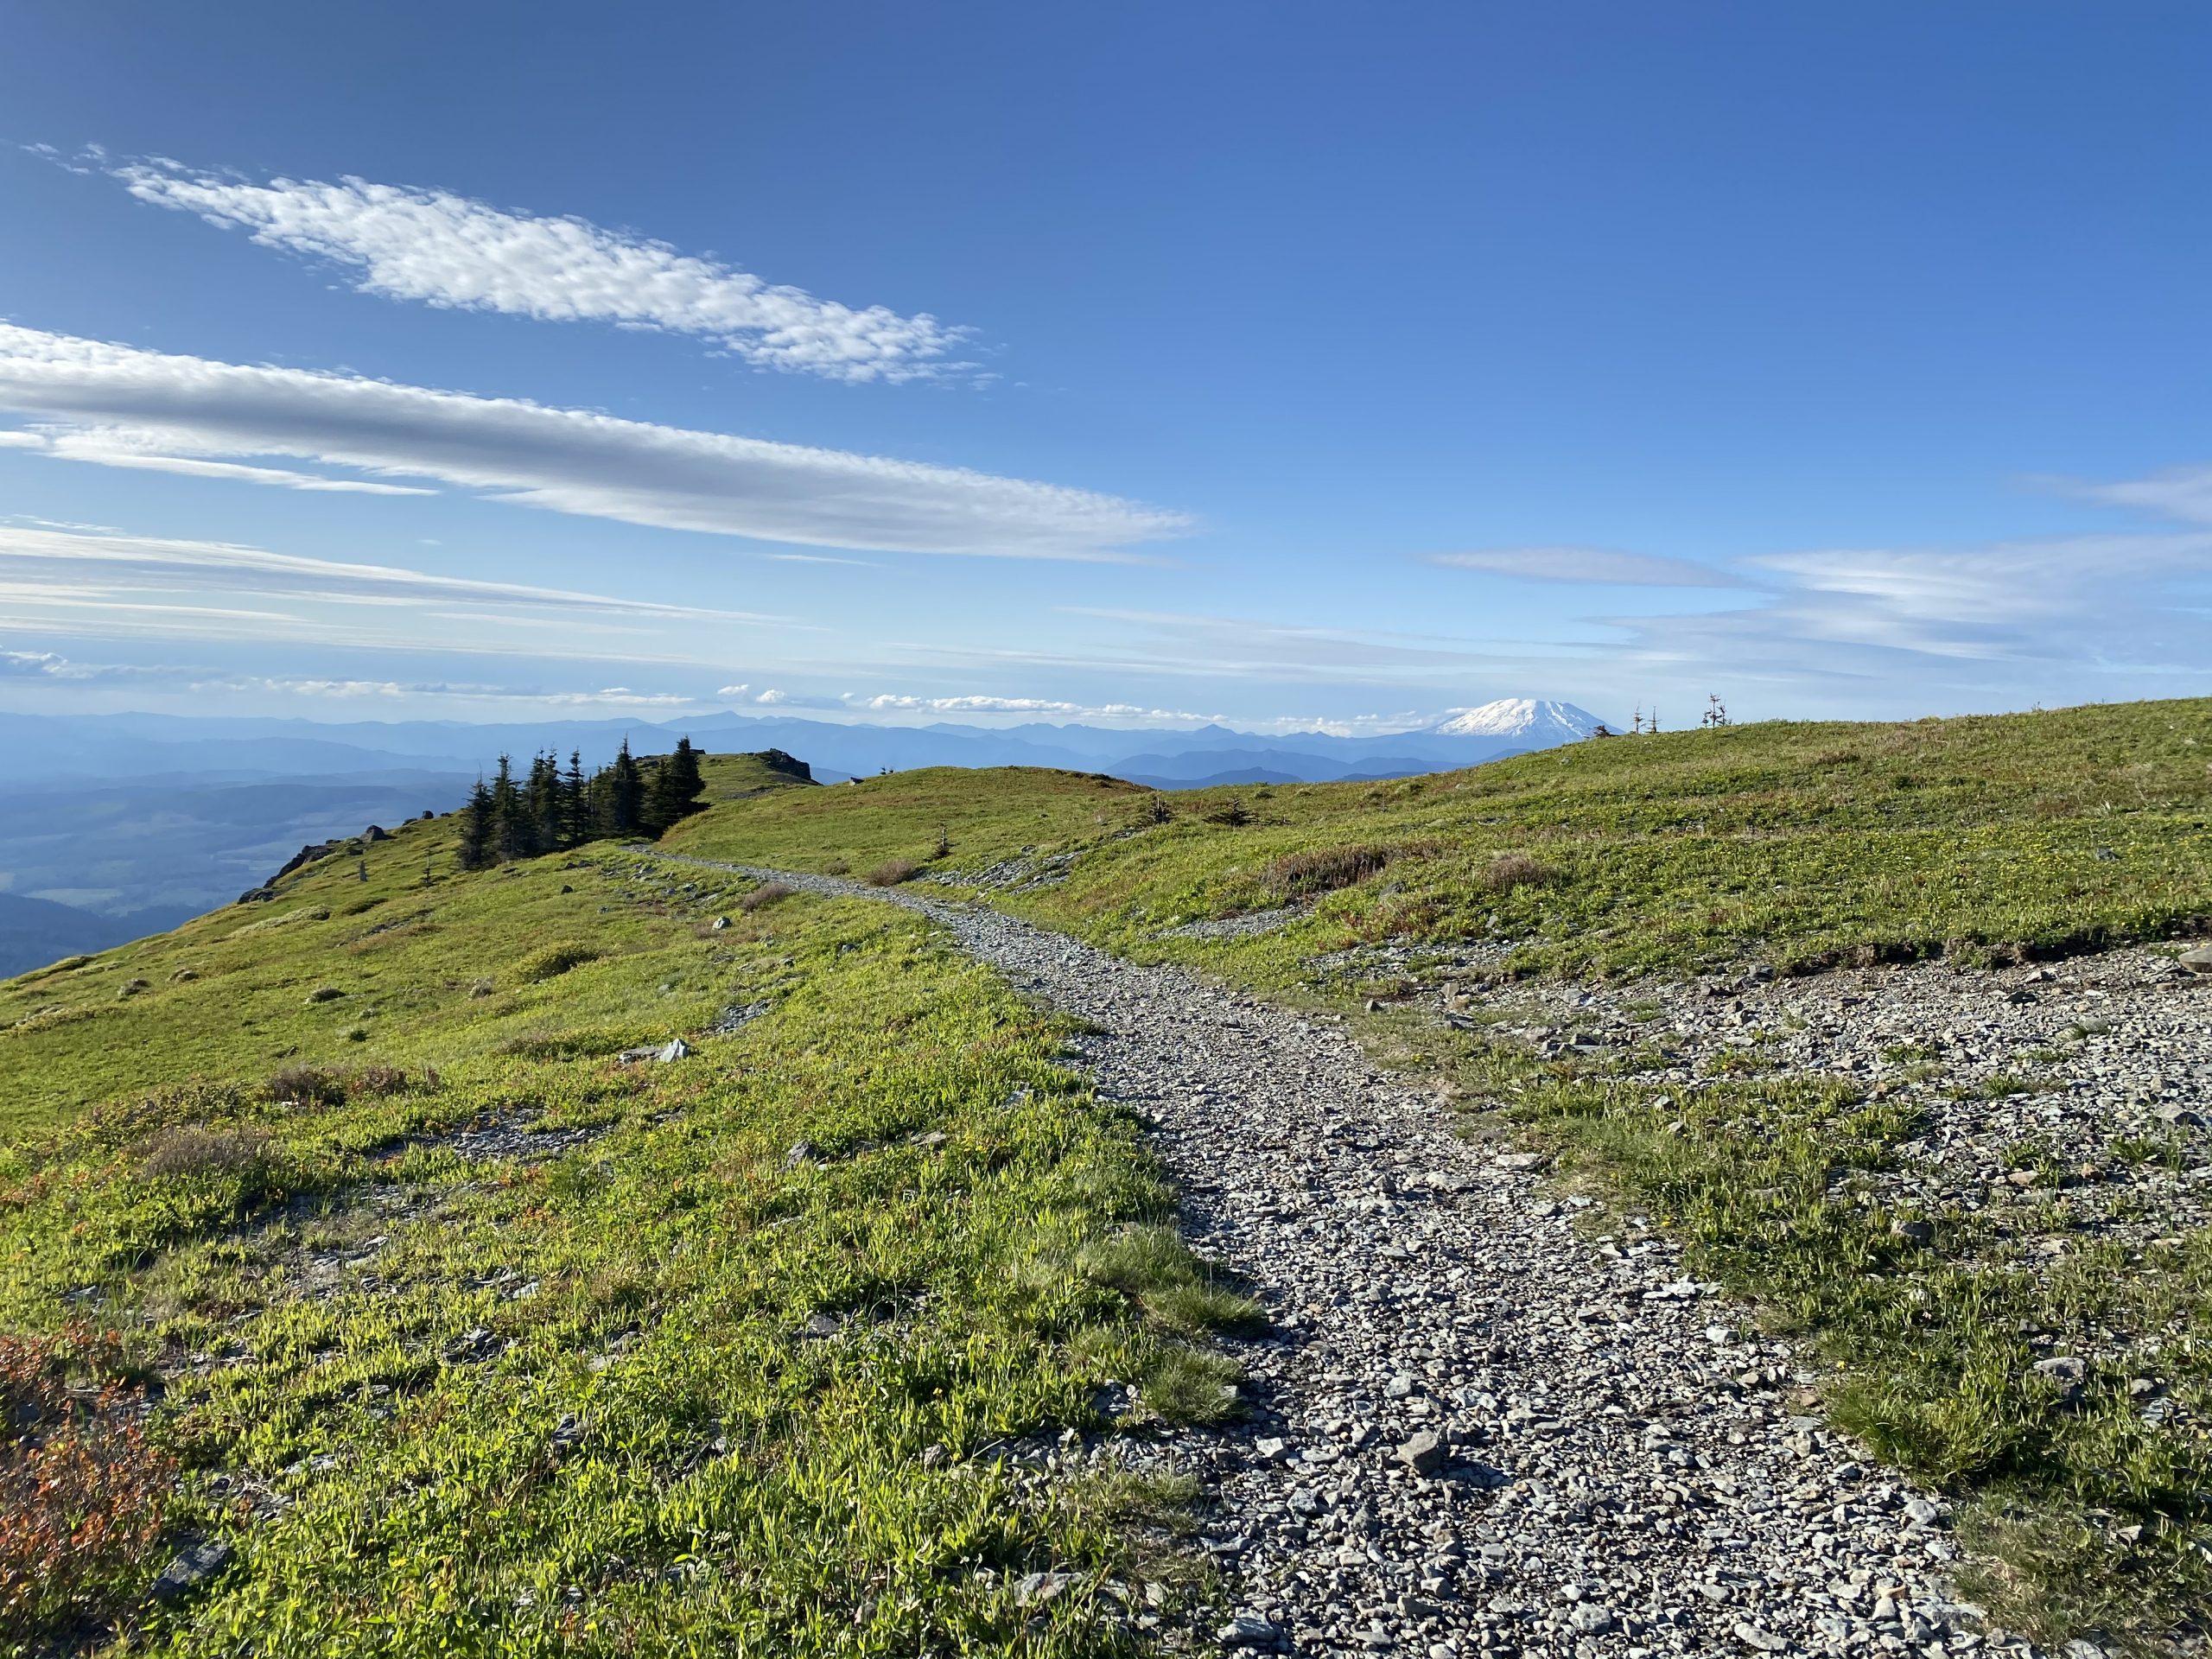 Silverstar Mountain Ed's Trail